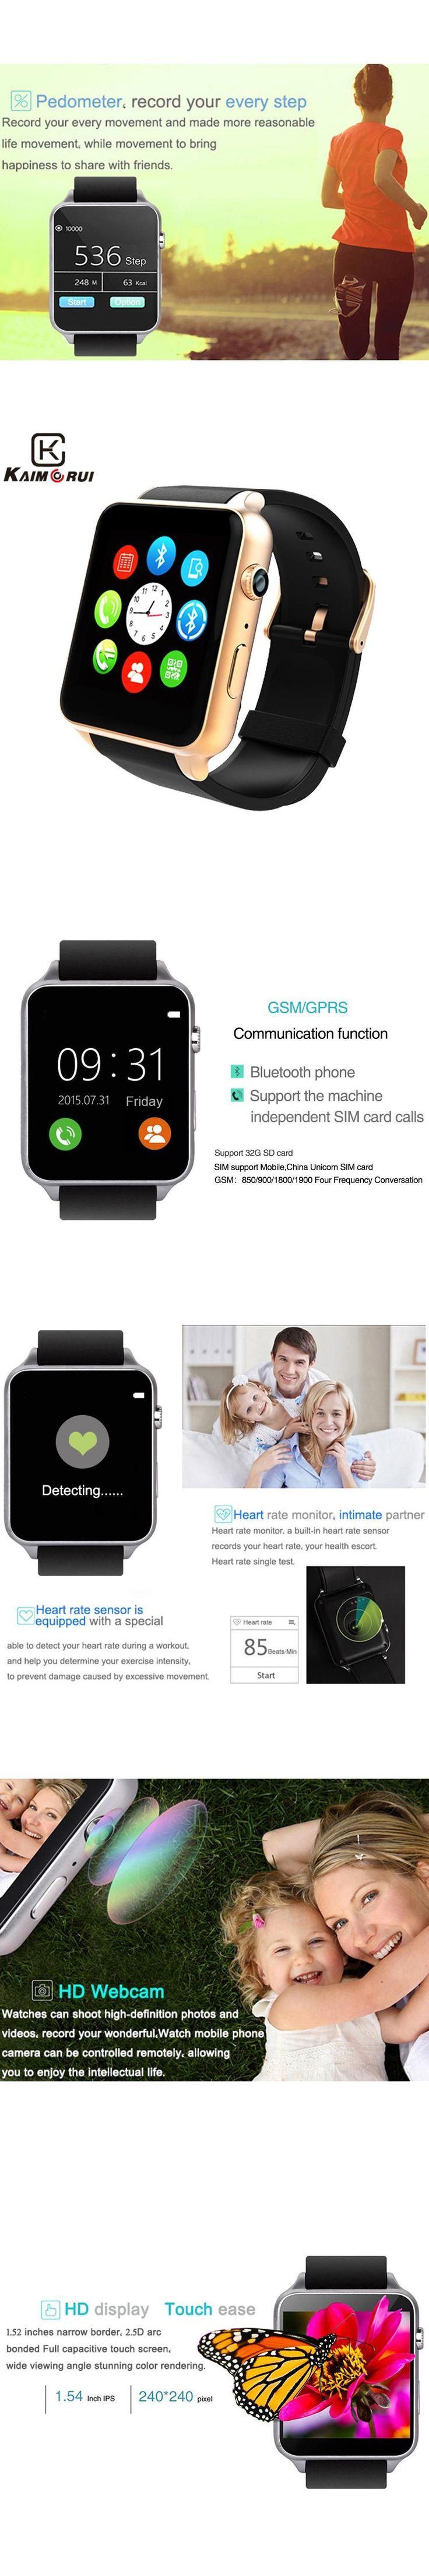 Kaimorui Bluetooth Smart Watch Heart Rate Sleep Monitor Support TF/SIM Card Smartwatch for iPhone and Android Smart Watches #Smartwatches